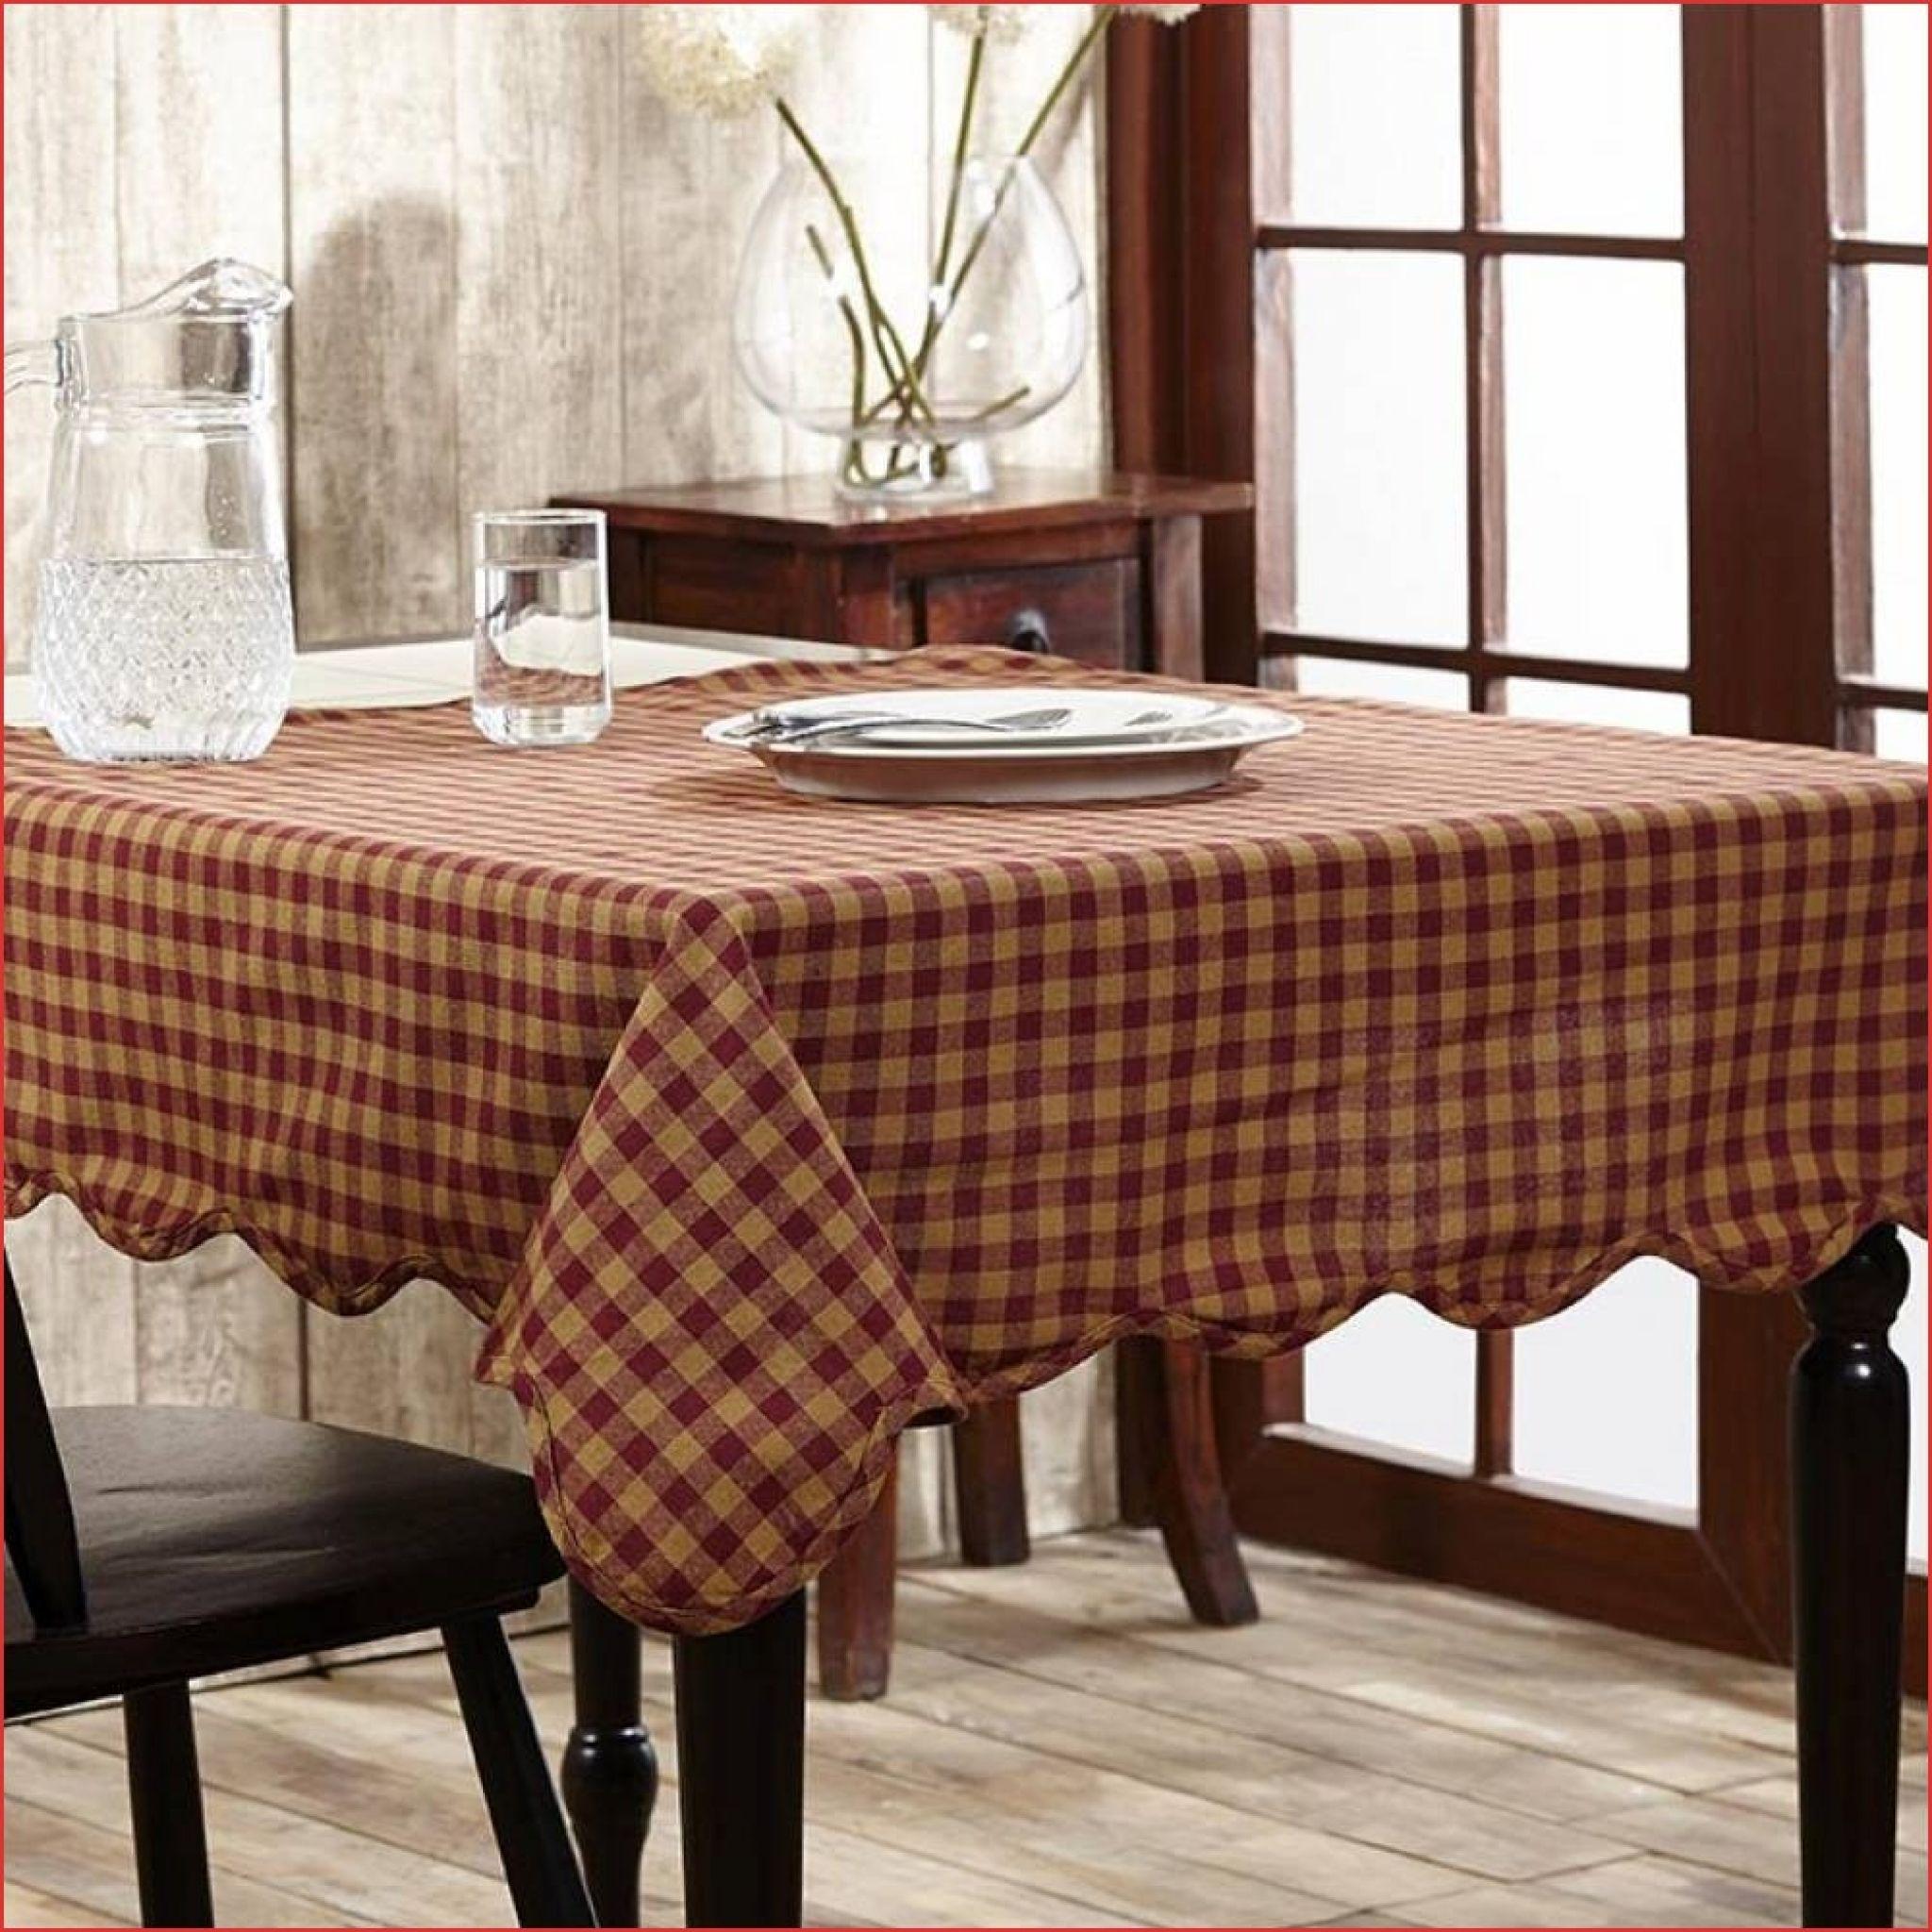 Star Furniture Outdoor Furniture Cool House Inteiror Ideas •